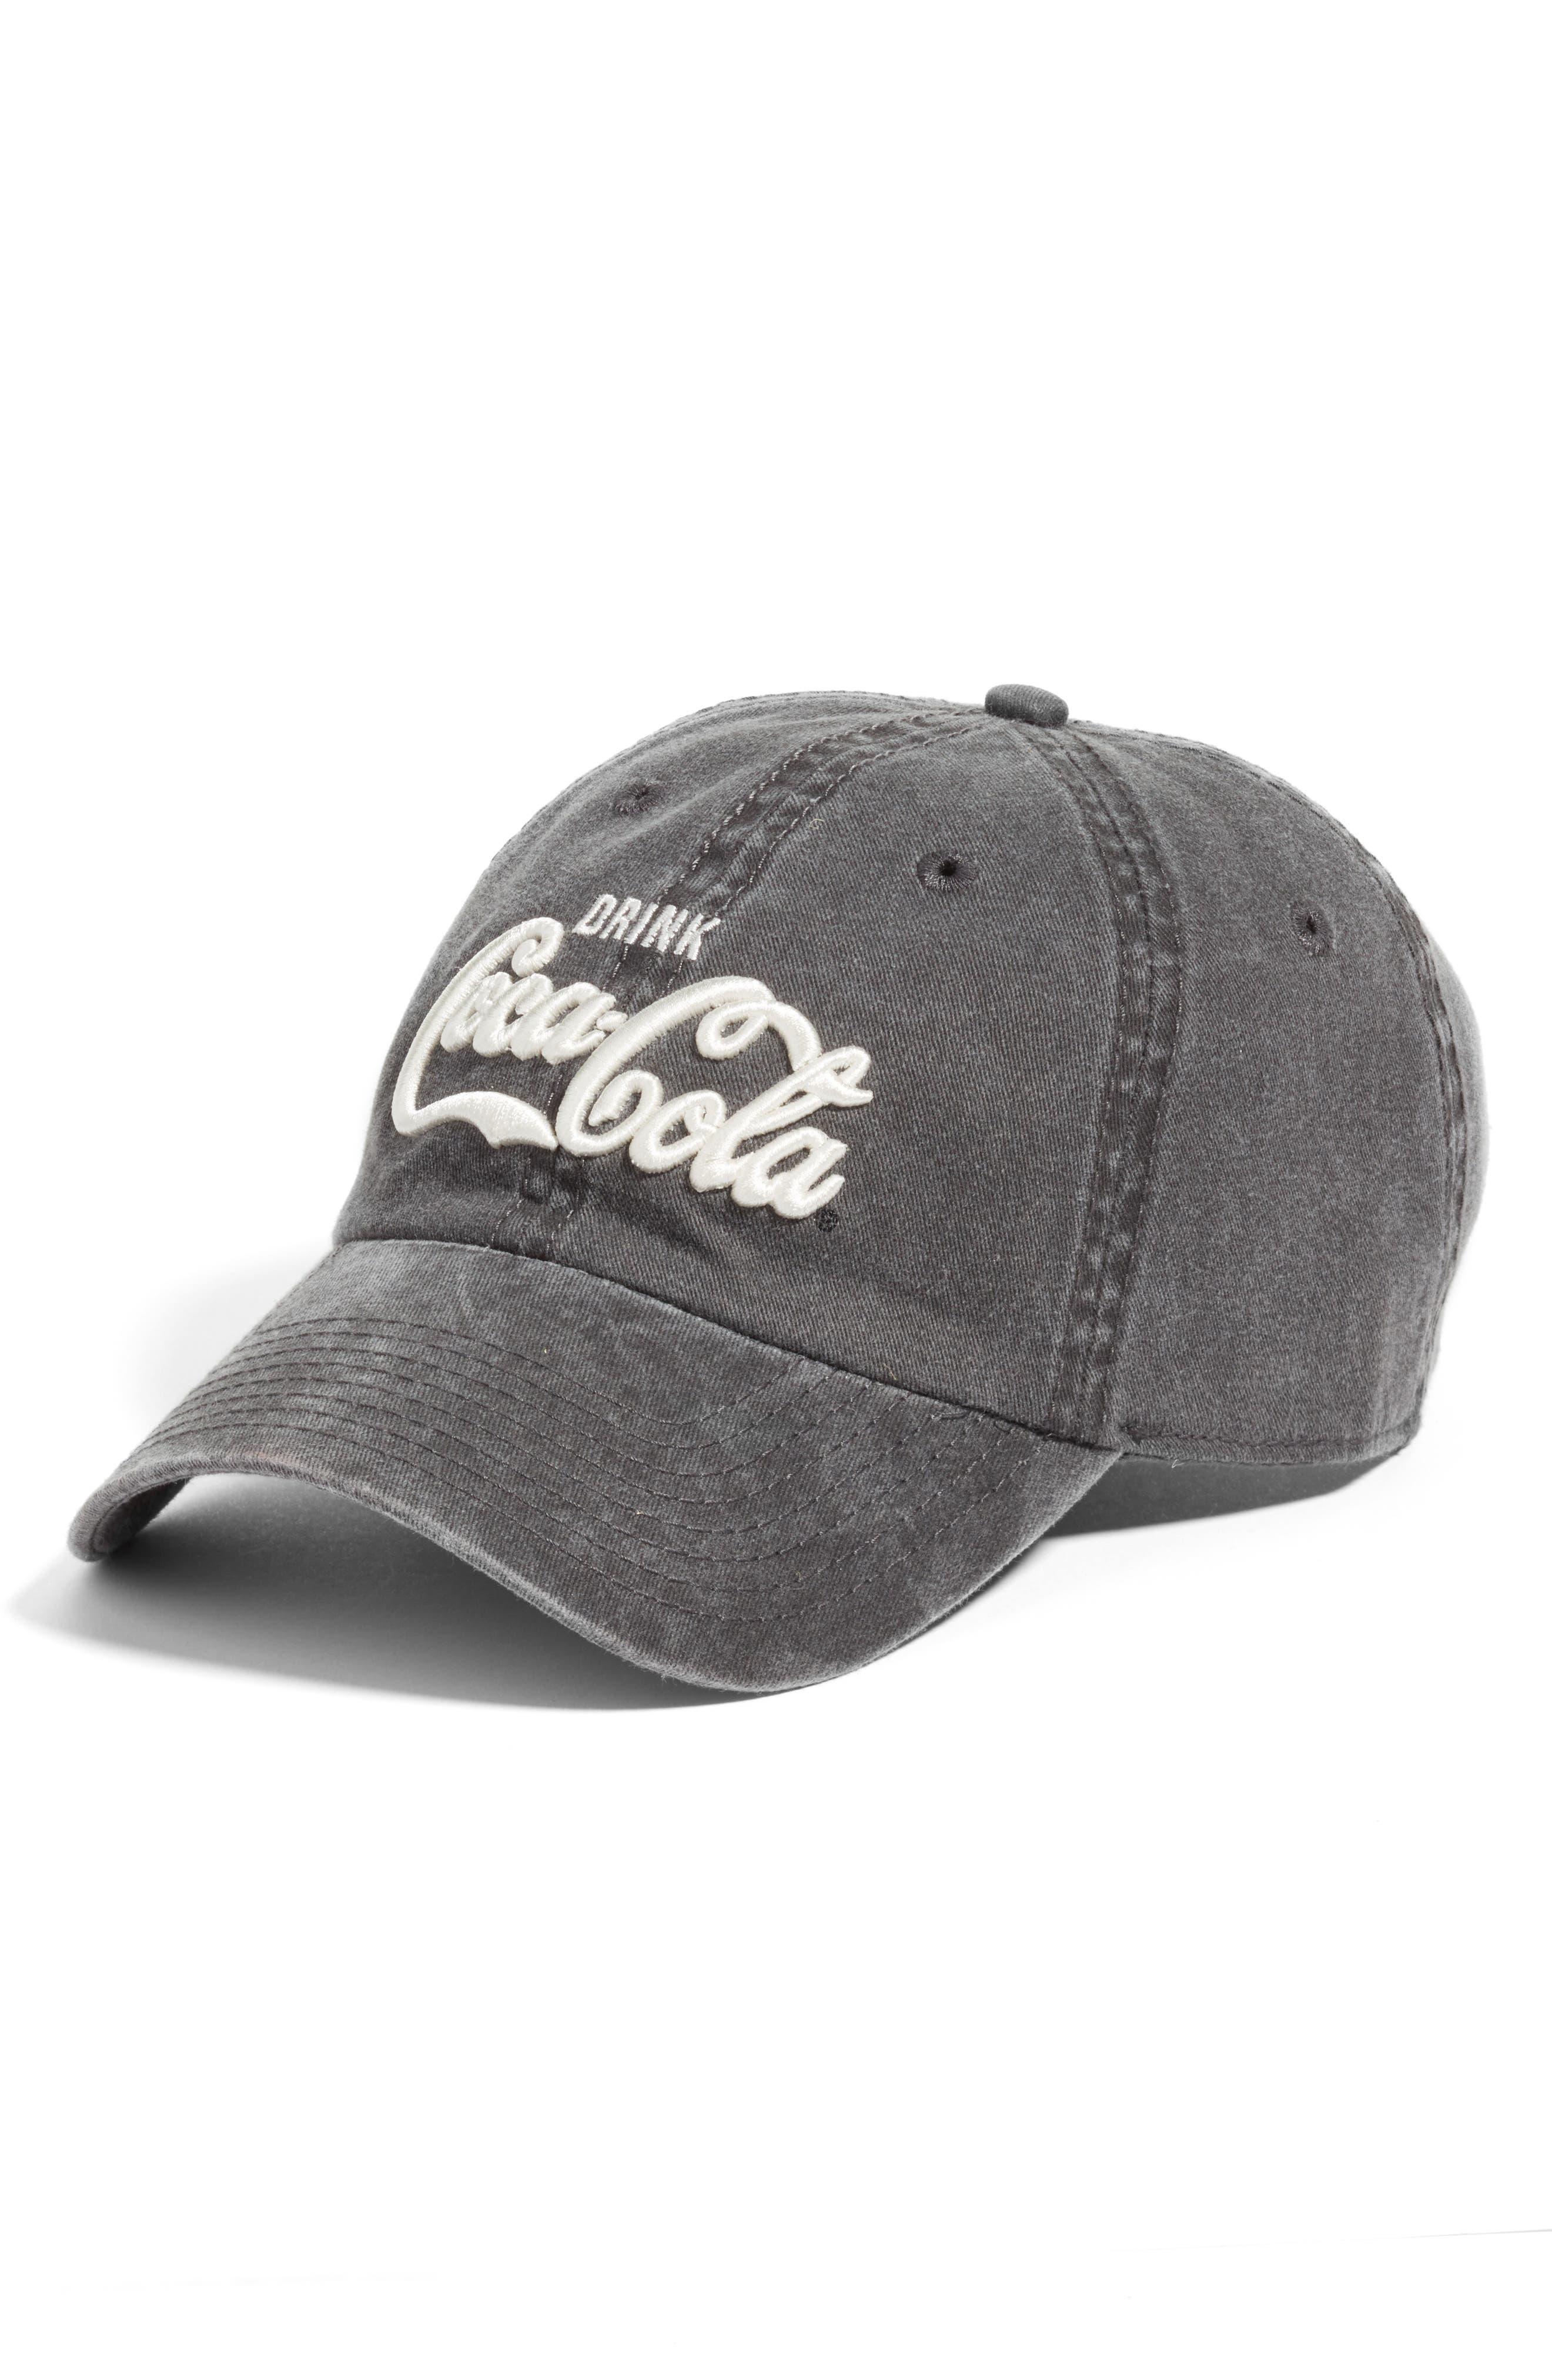 Main Image - American Needle New Raglan - Coca-Cola Baseball Cap